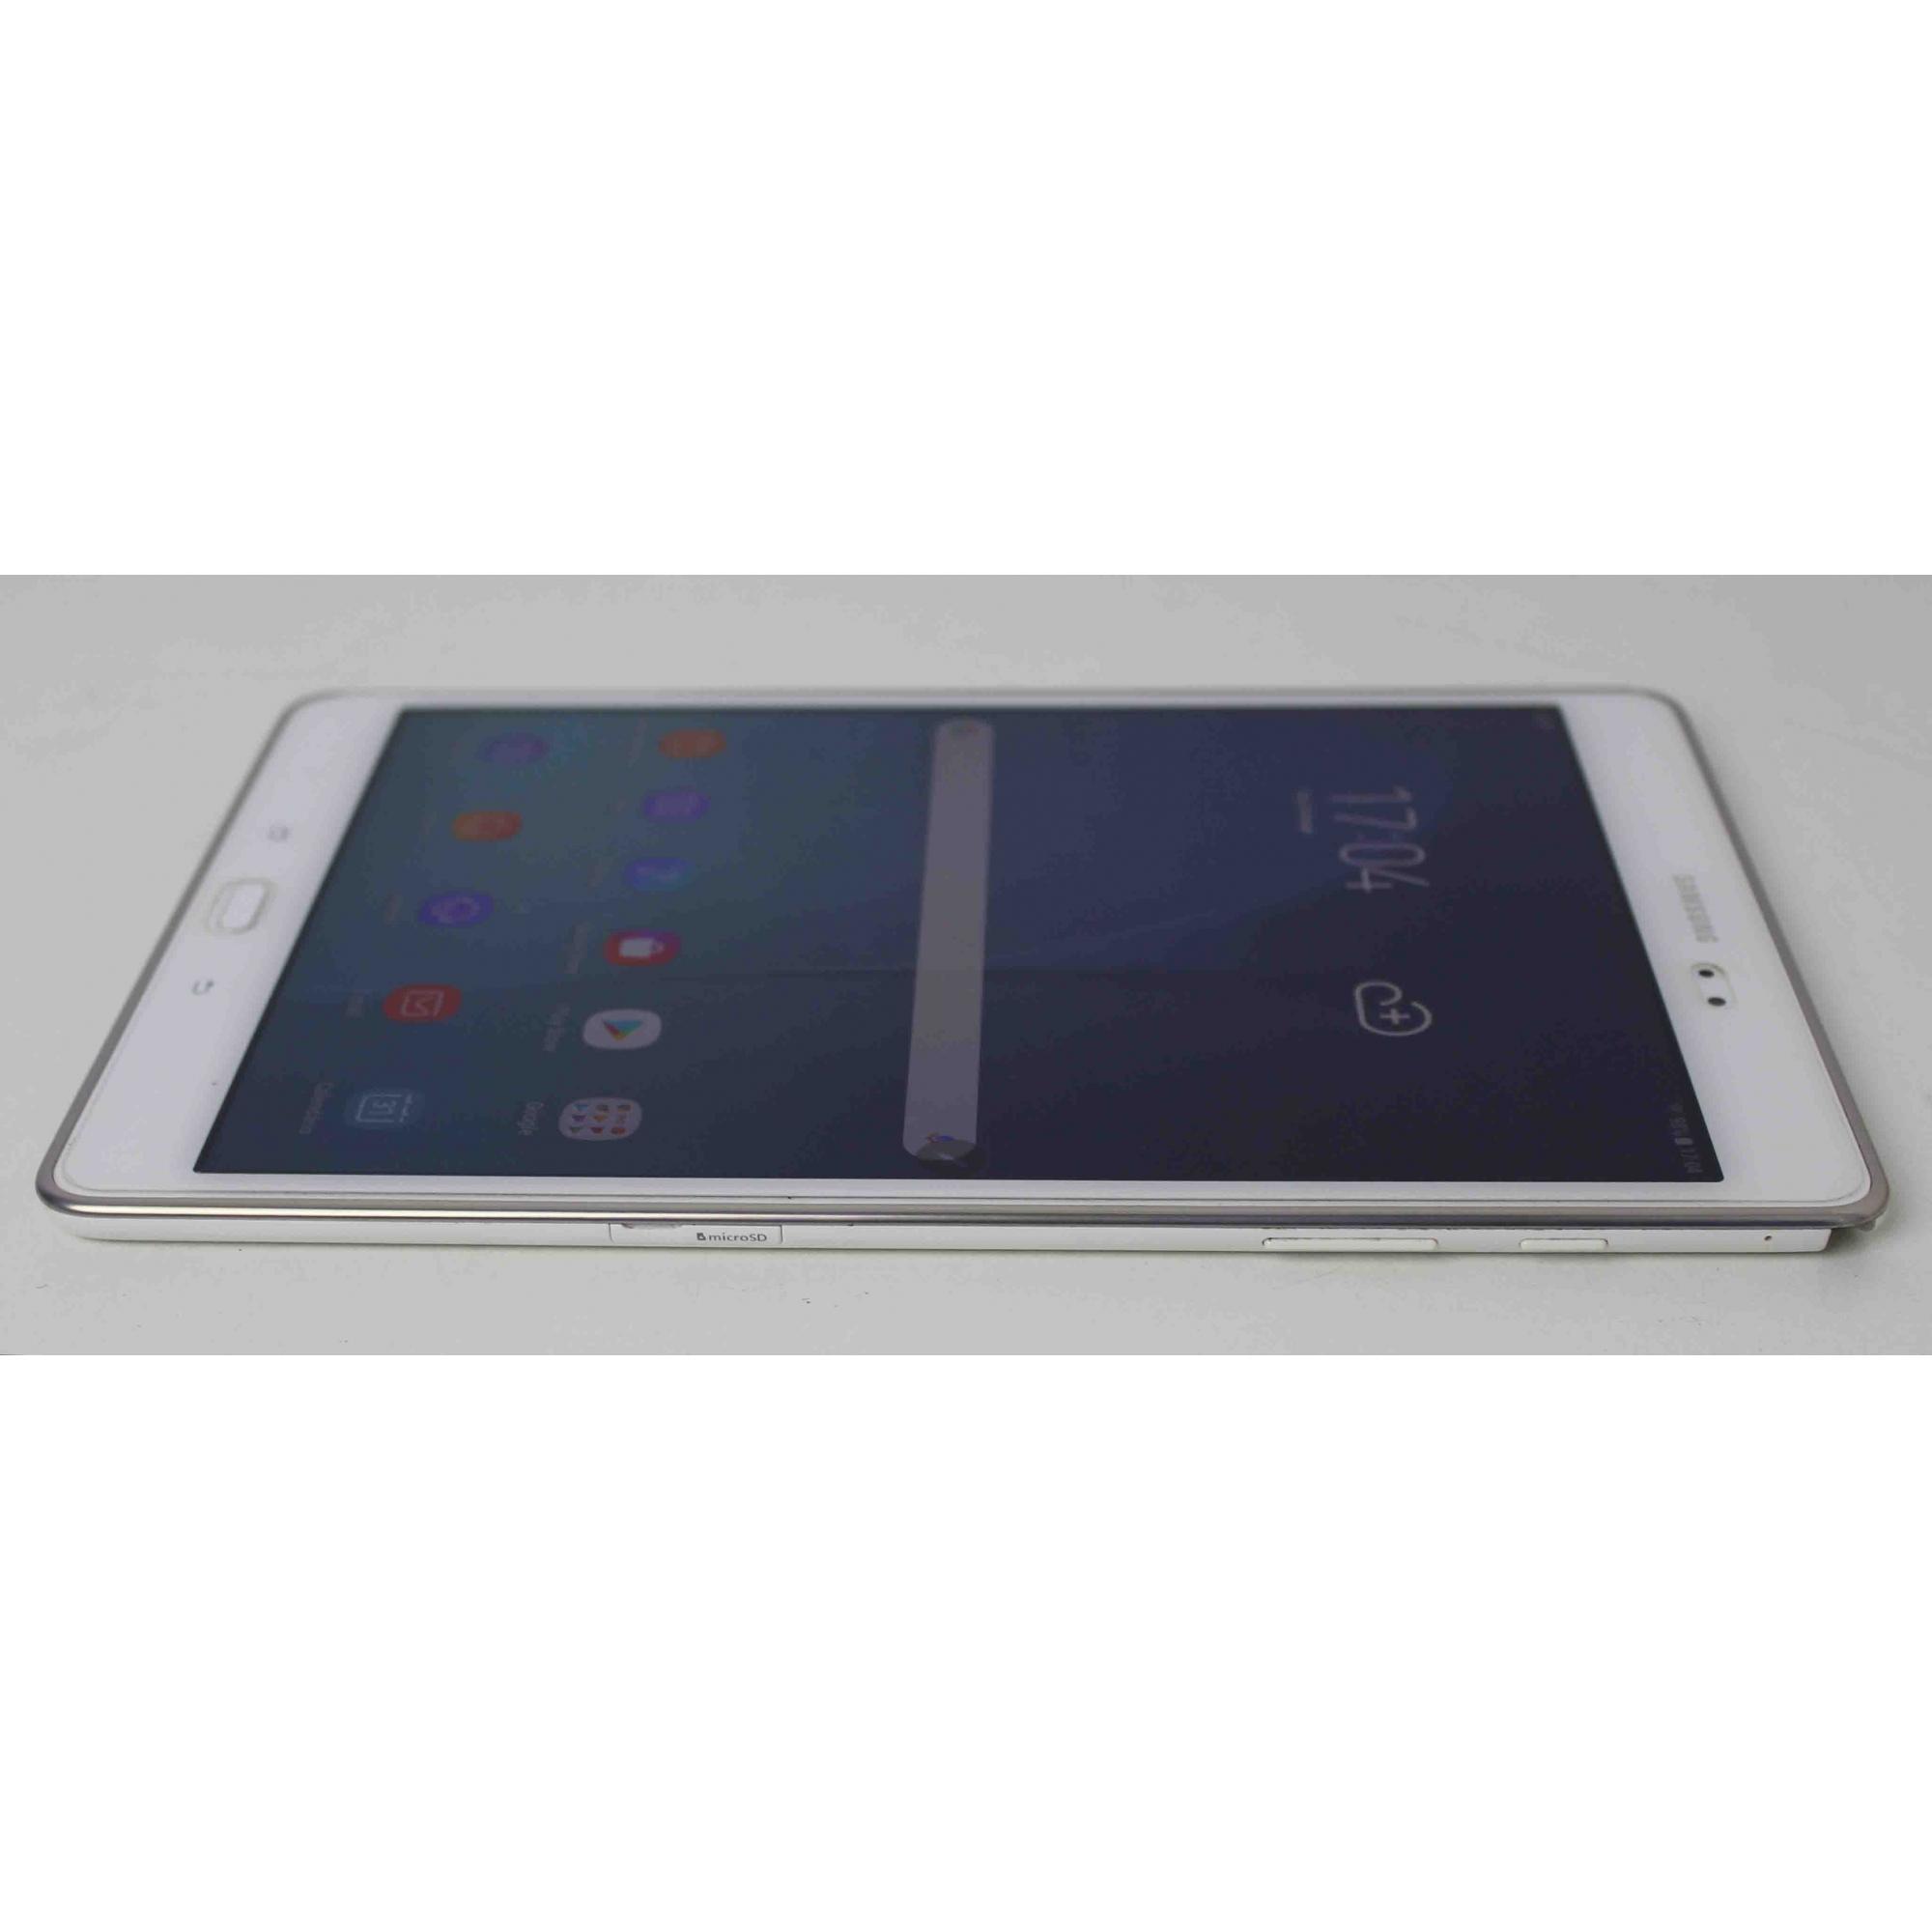 "Tablet Samsung Galaxy Tab A SM-P550 9.7"" 16GB - Wifi (Branco)"